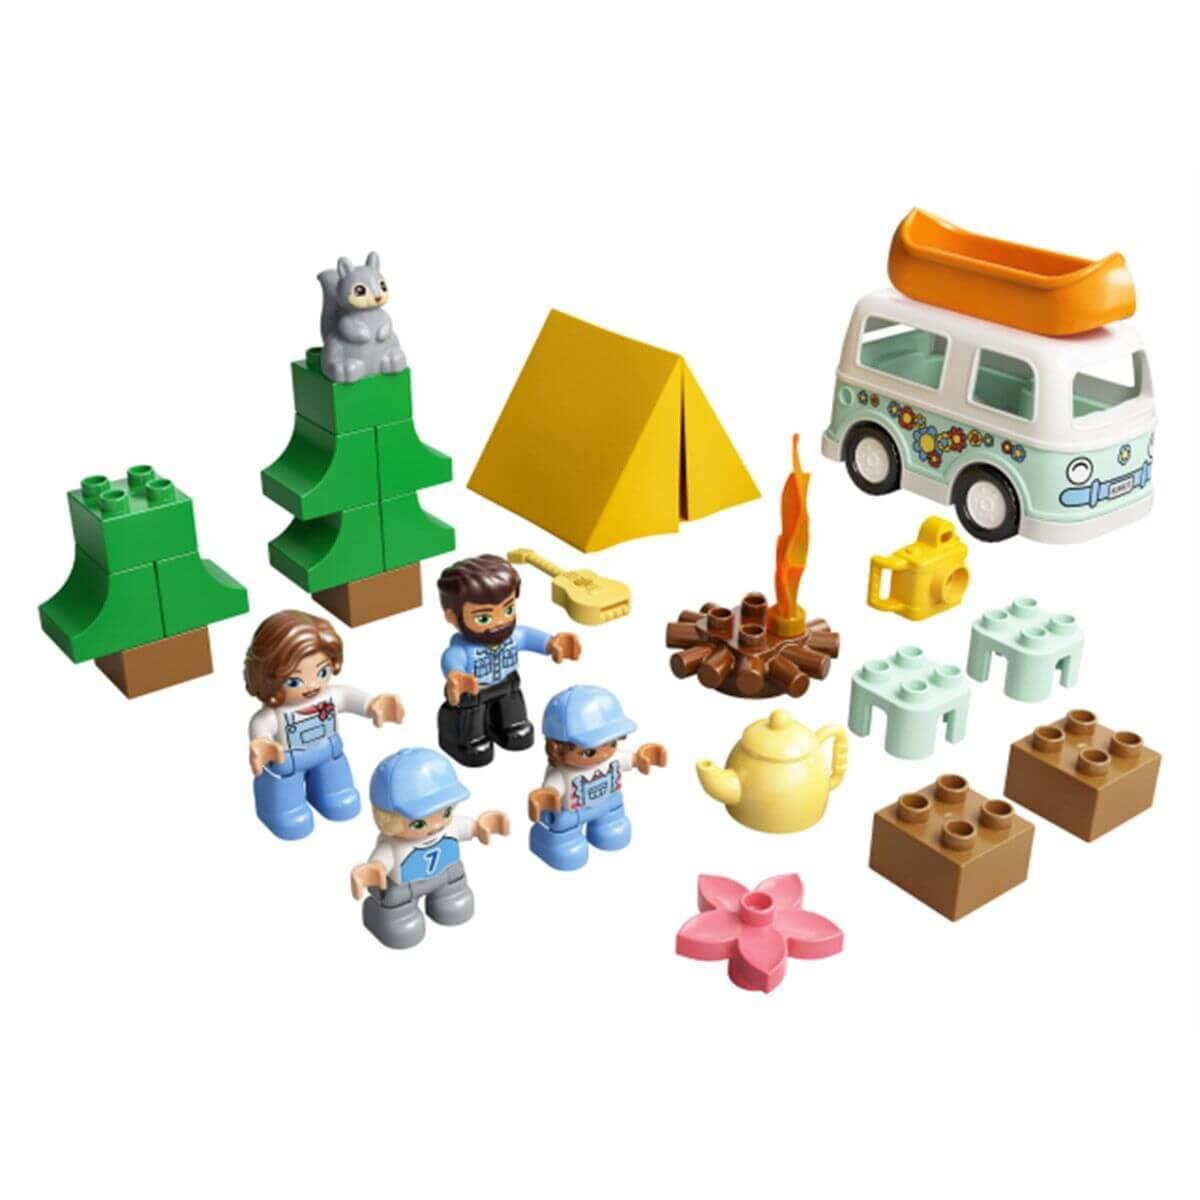 LEGO DUPLO Town Семейное приключение на микроавтобусе